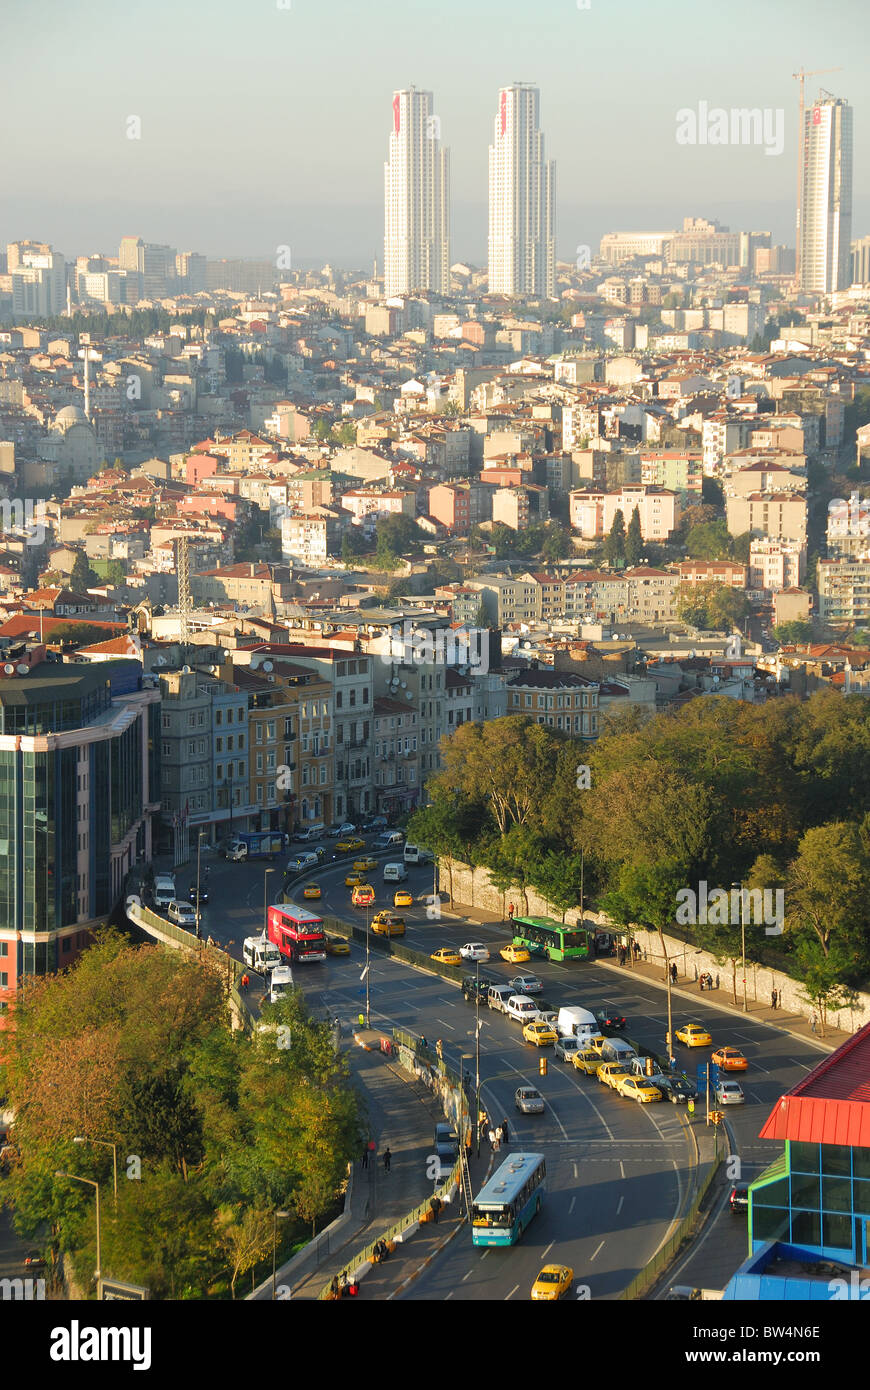 ISTANBUL, TURKEY. A view down on Tarlabasi Bulvari in Beyoglu, with Sisli district in the distance. Autumn 2010. Stock Photo